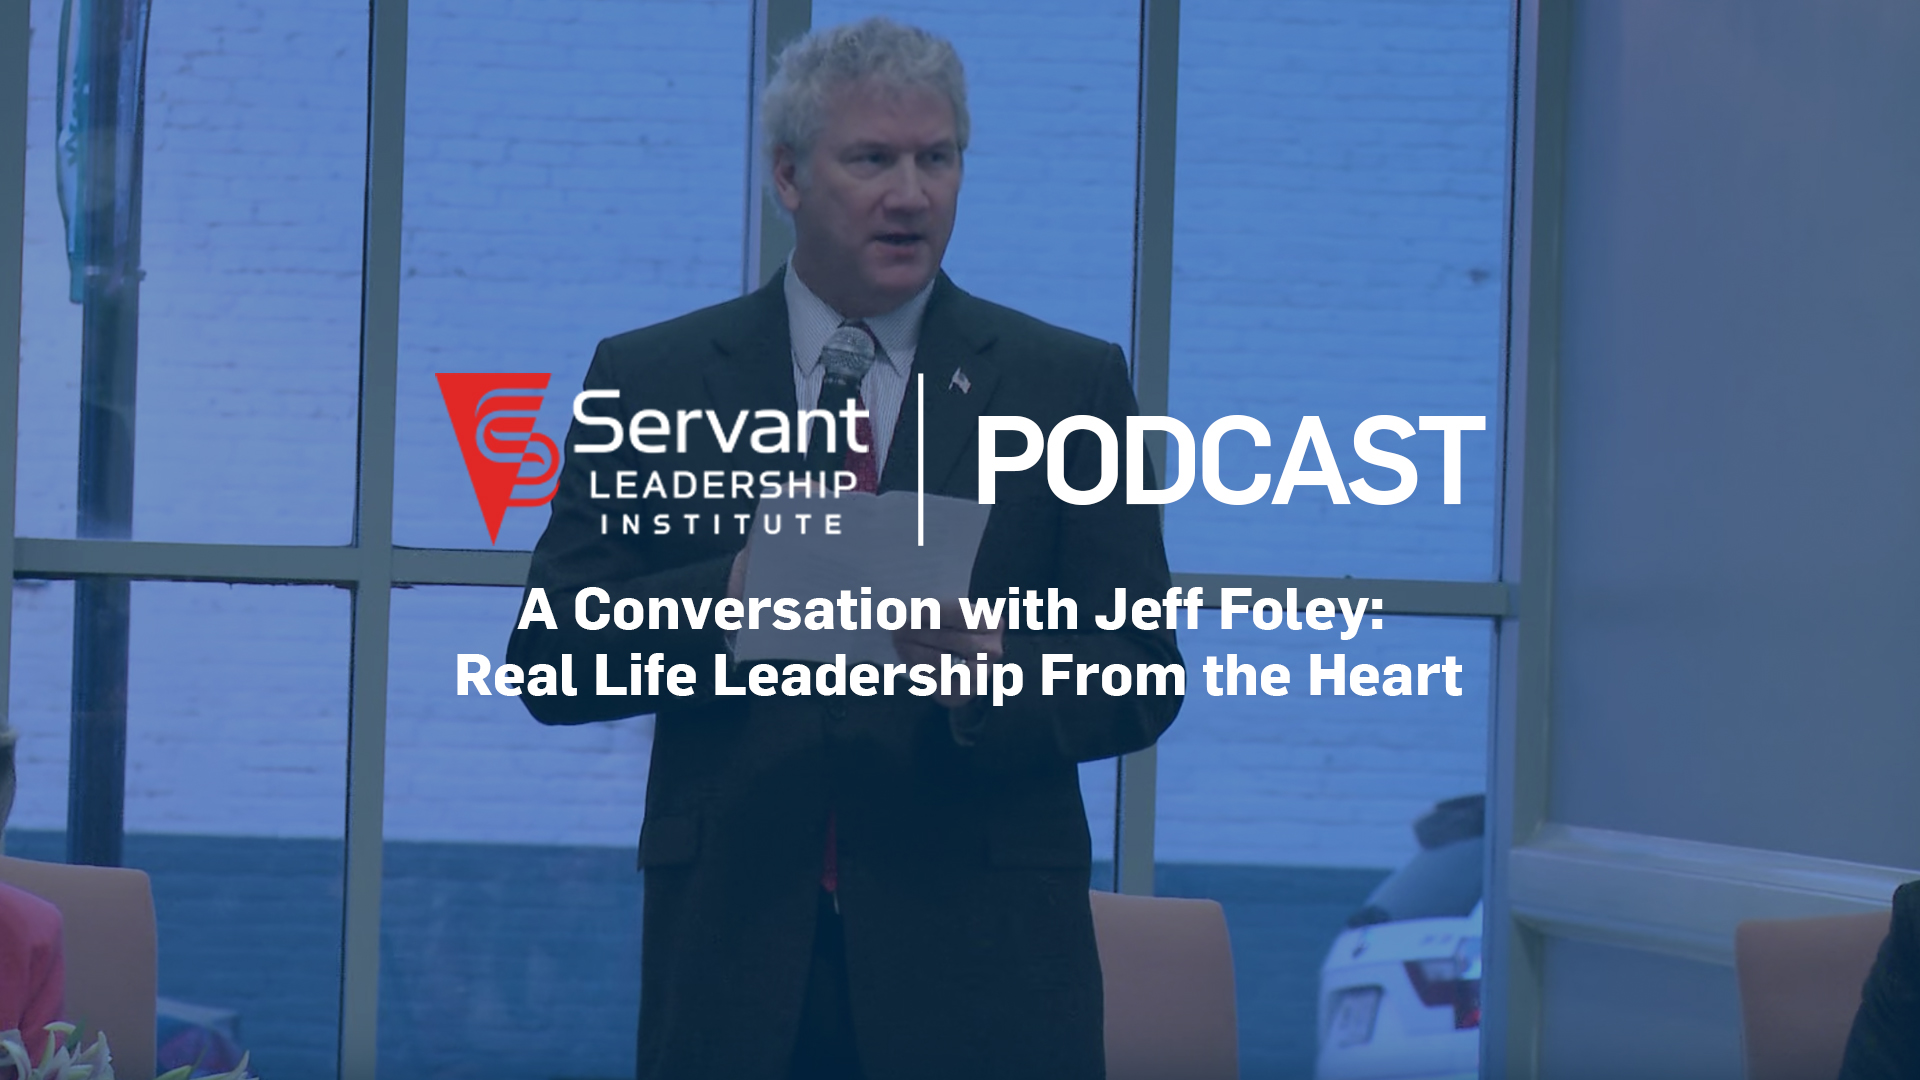 Jeff Foley Podcast 1920x1080.jpg